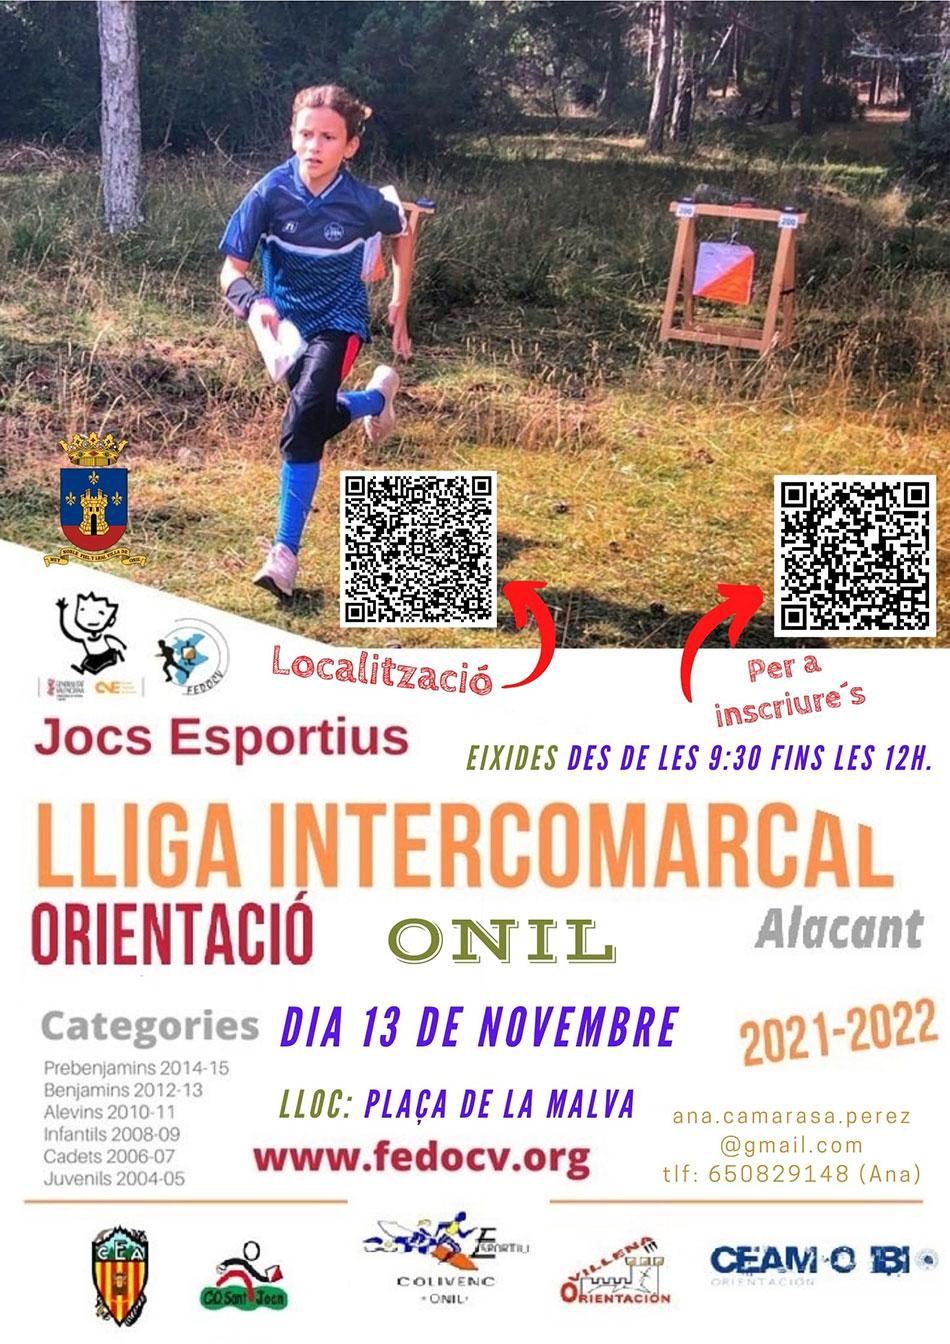 1ª prueba Liga Escolar Intercomarcal de Orientación de Alicante 2021/2022: Onil